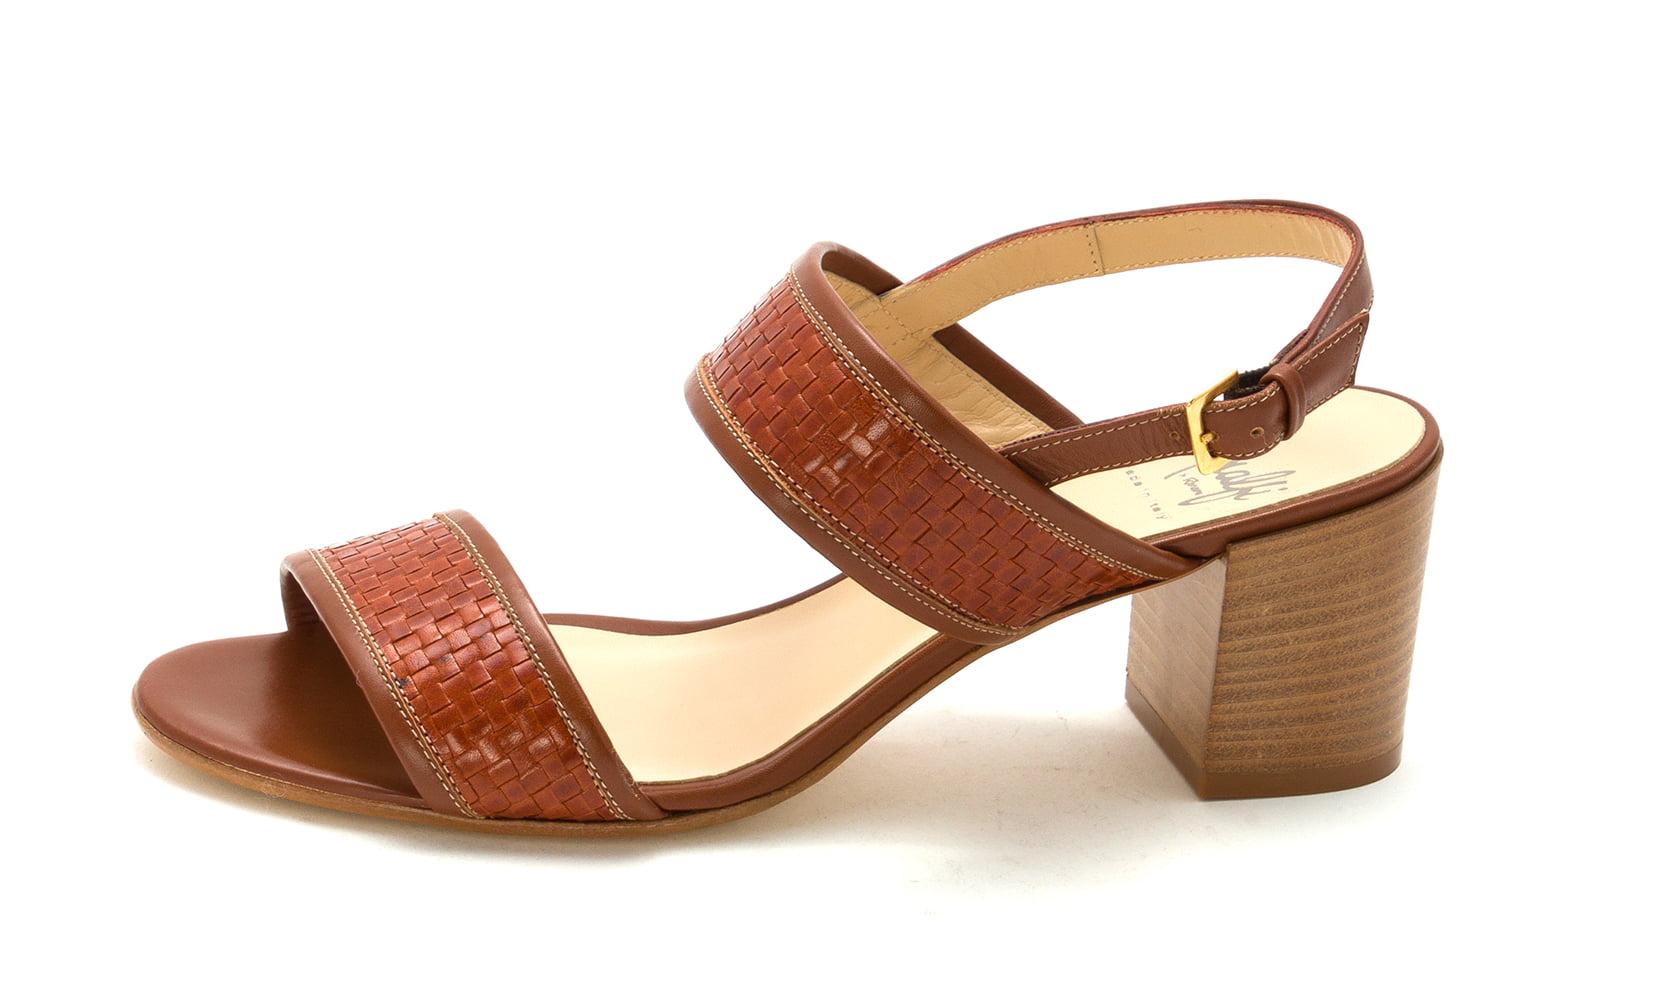 Amalfi by Rangoni Womens Marisol Open Toe Formal Mule Sandals by Amalfi by Rangoni